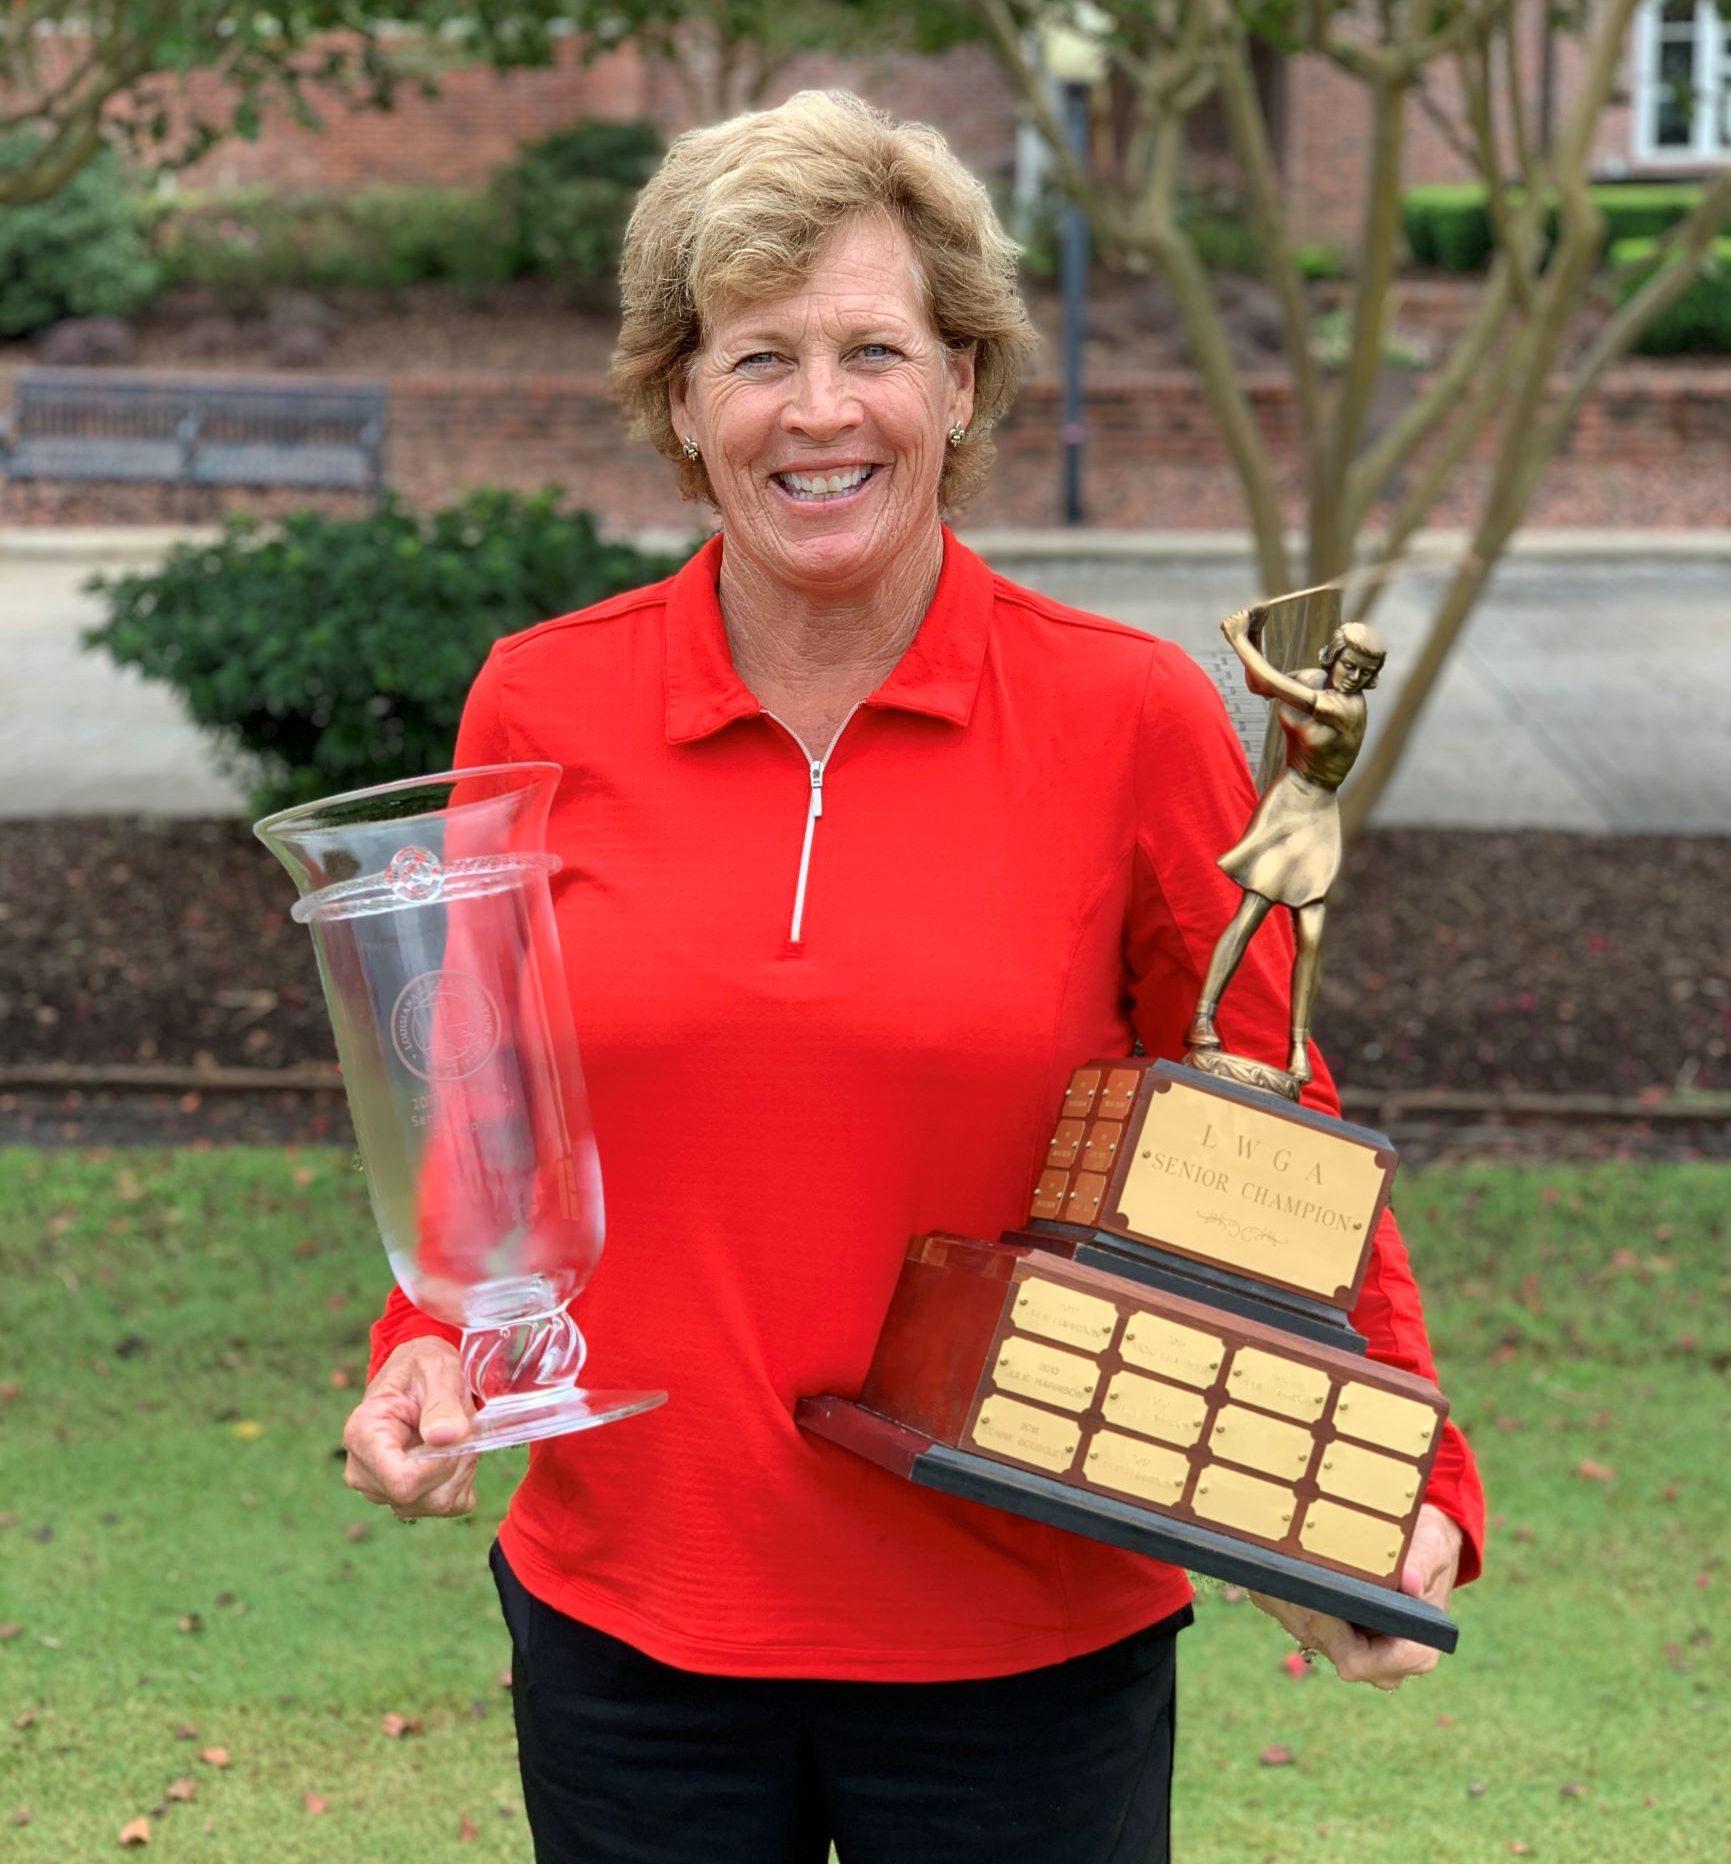 Julie Harrison Wins Fourth Straight LGA Women's Senior Amateur Championship